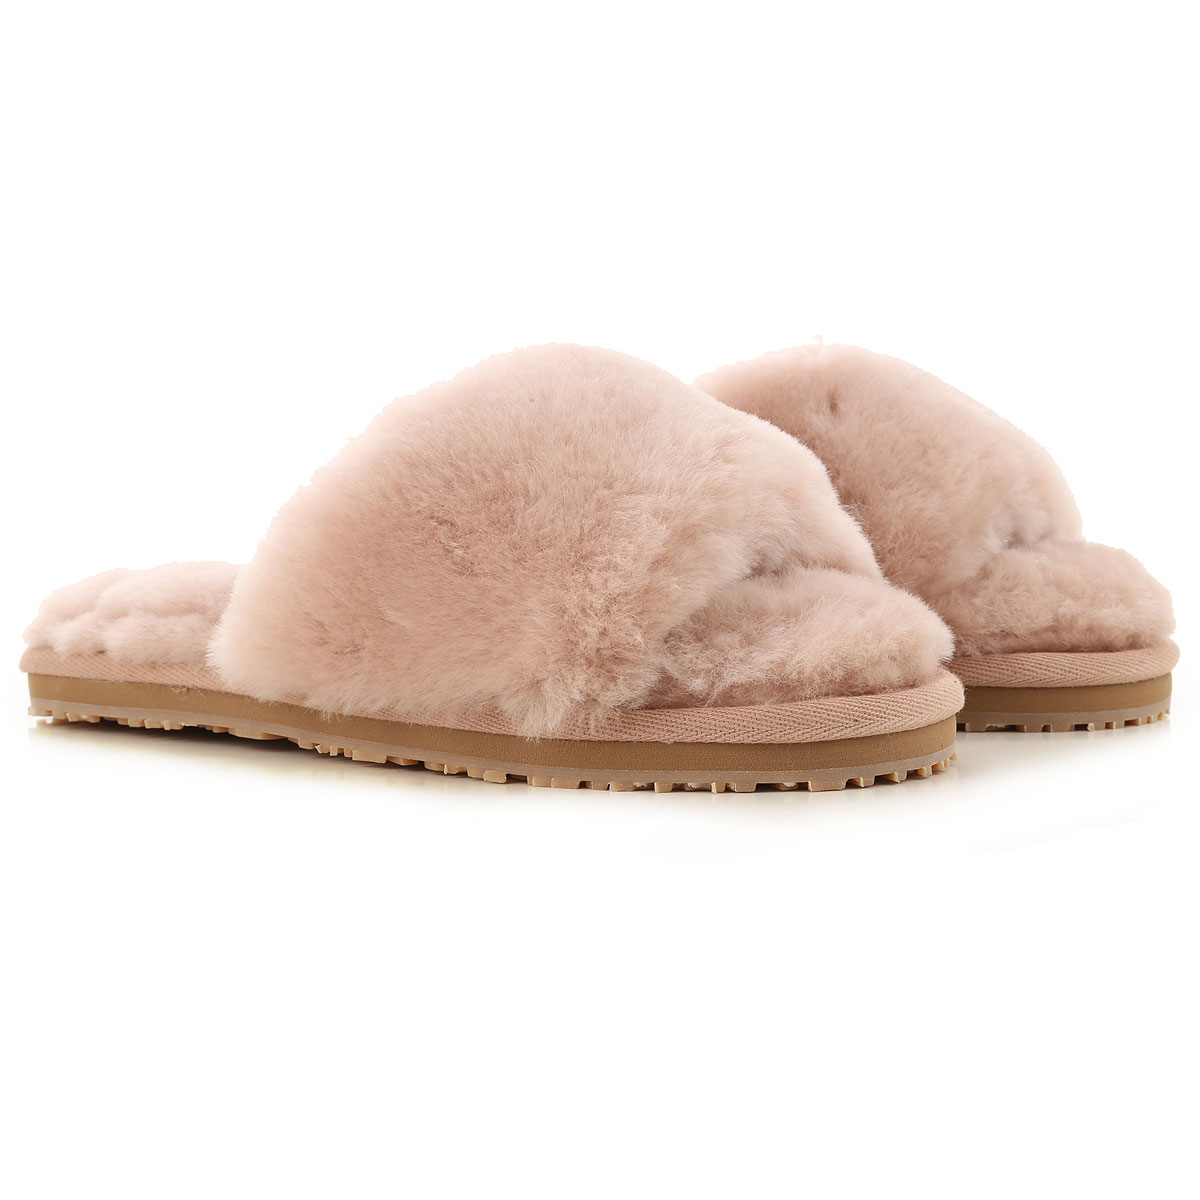 Mou Sandals for Women On Sale, Powder, Fur, 2019, EUR 36 - UK 3 - USA 5.5 EUR 37 - UK 4 - USA 6.5